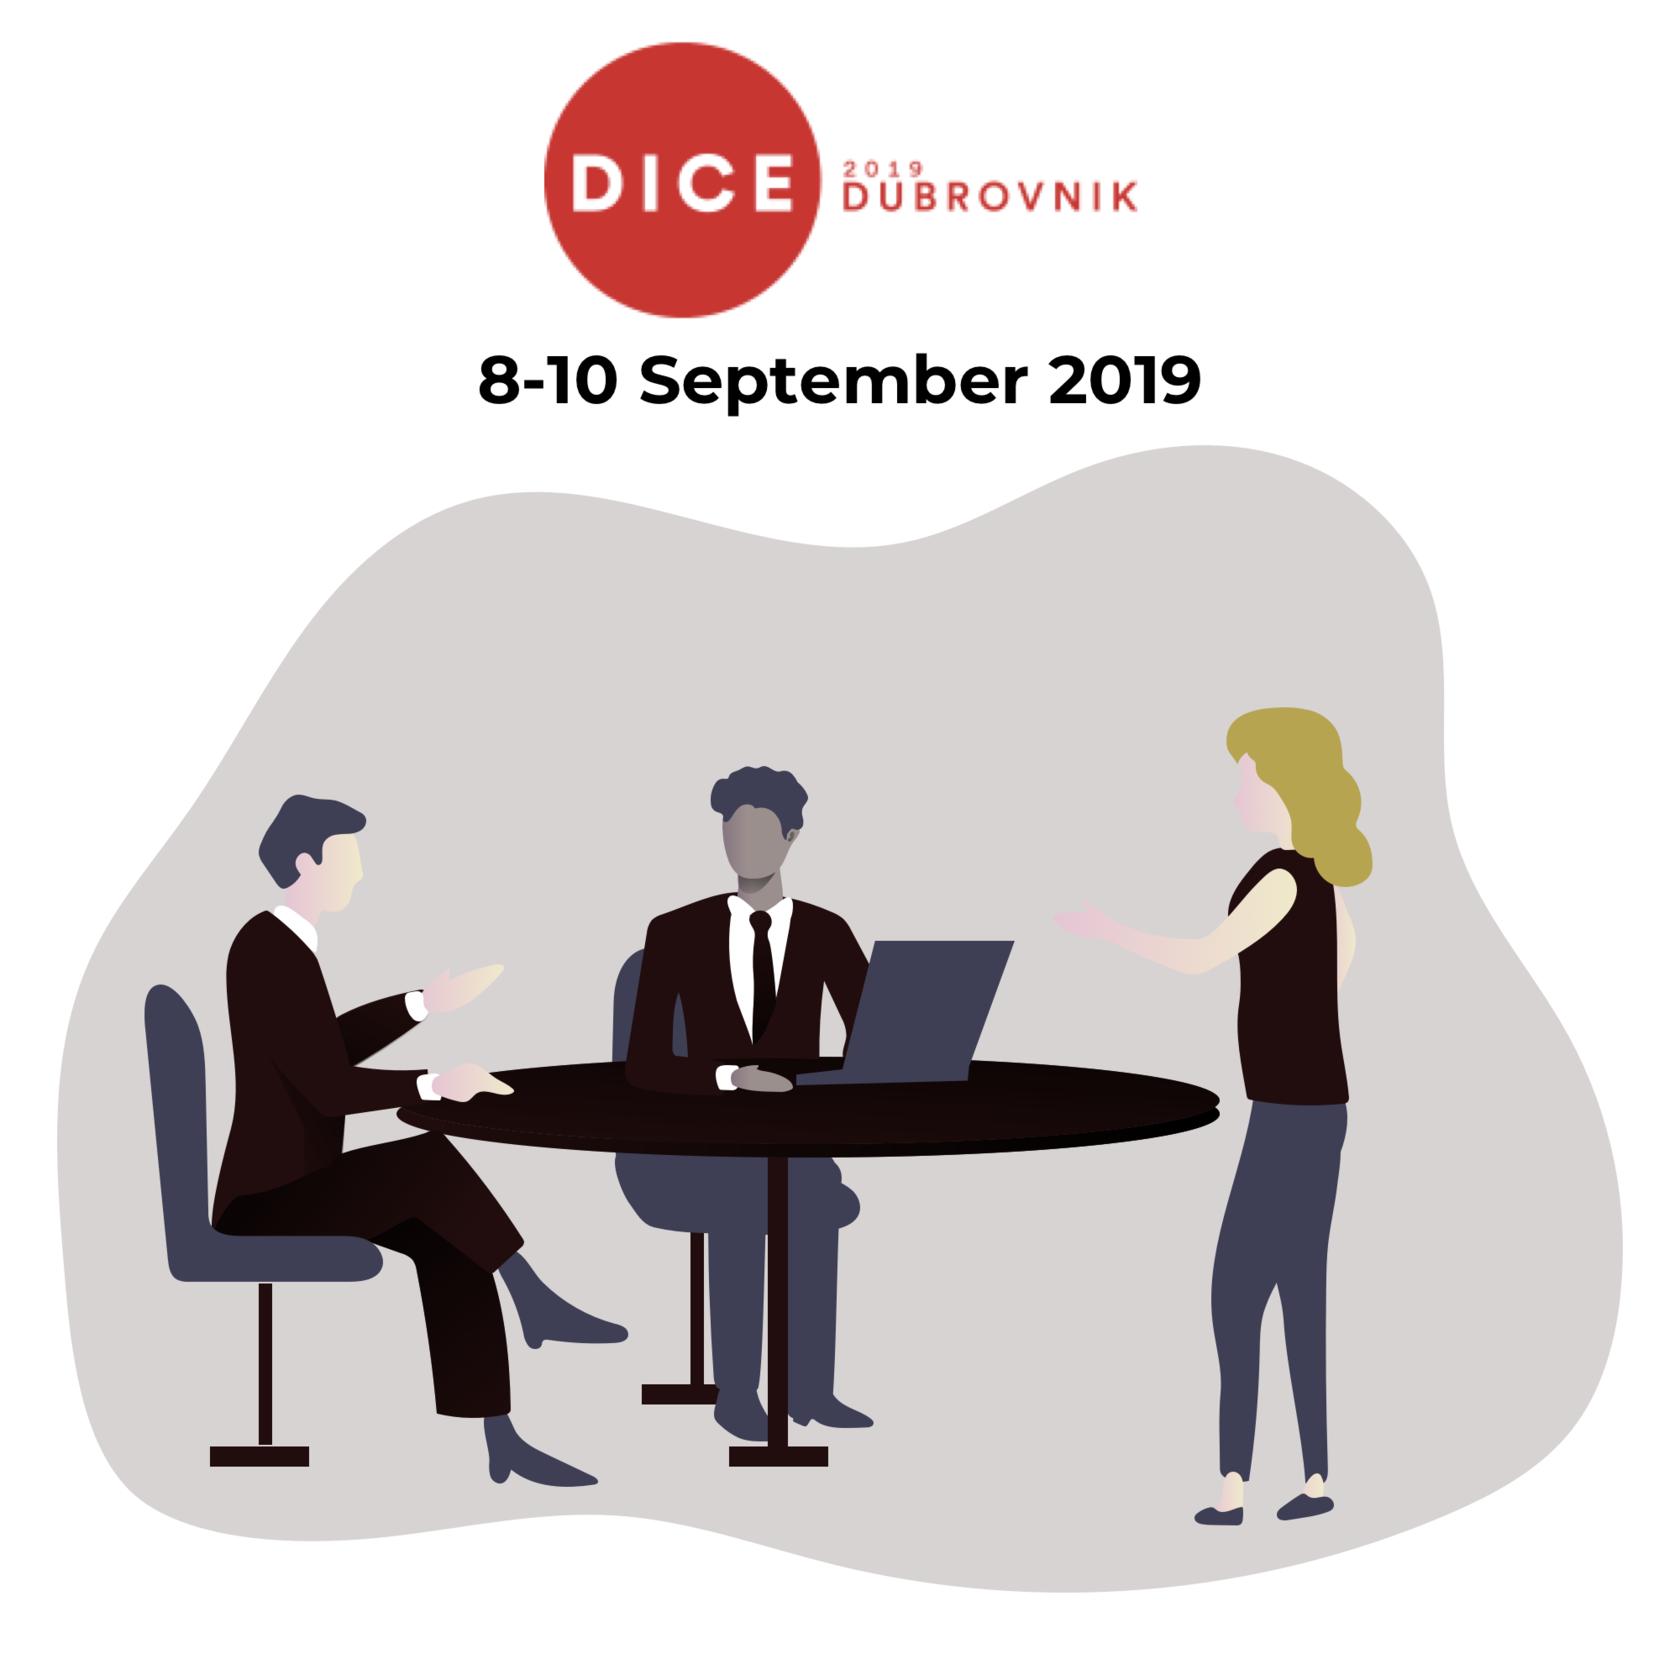 DICE Dubrovnik — September 8-10